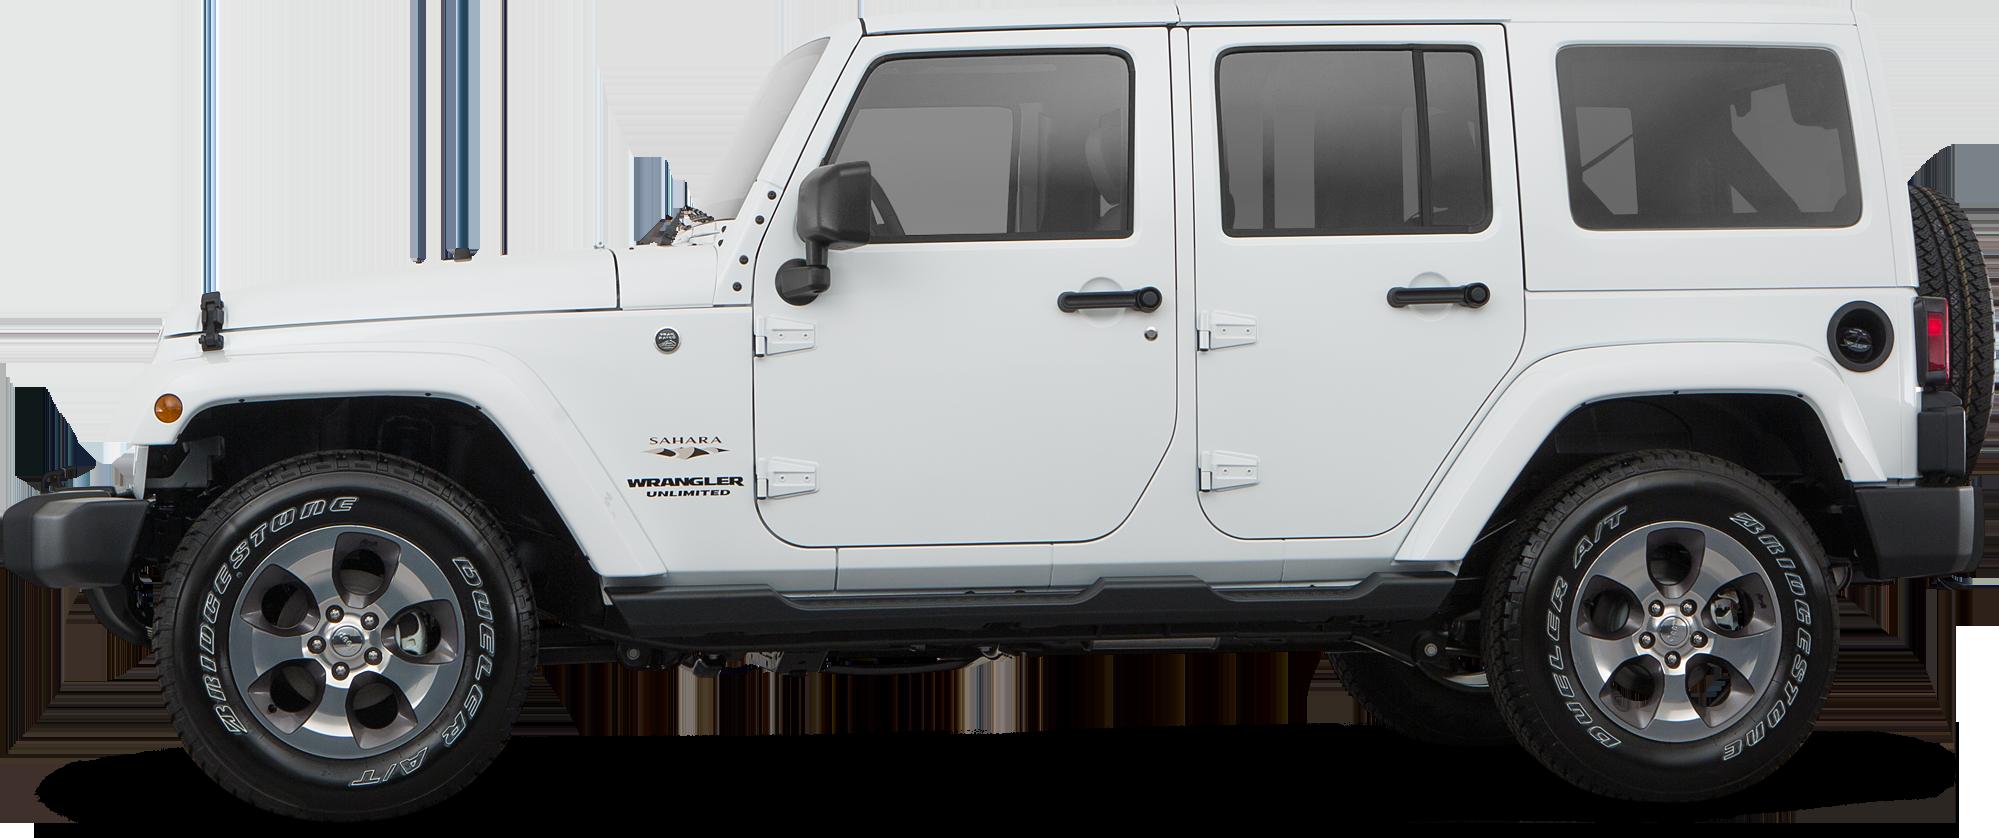 Unlimited Sahara 4x4 2018 Jeep Wrangler JK SUV Unlimited Sahara 4x4